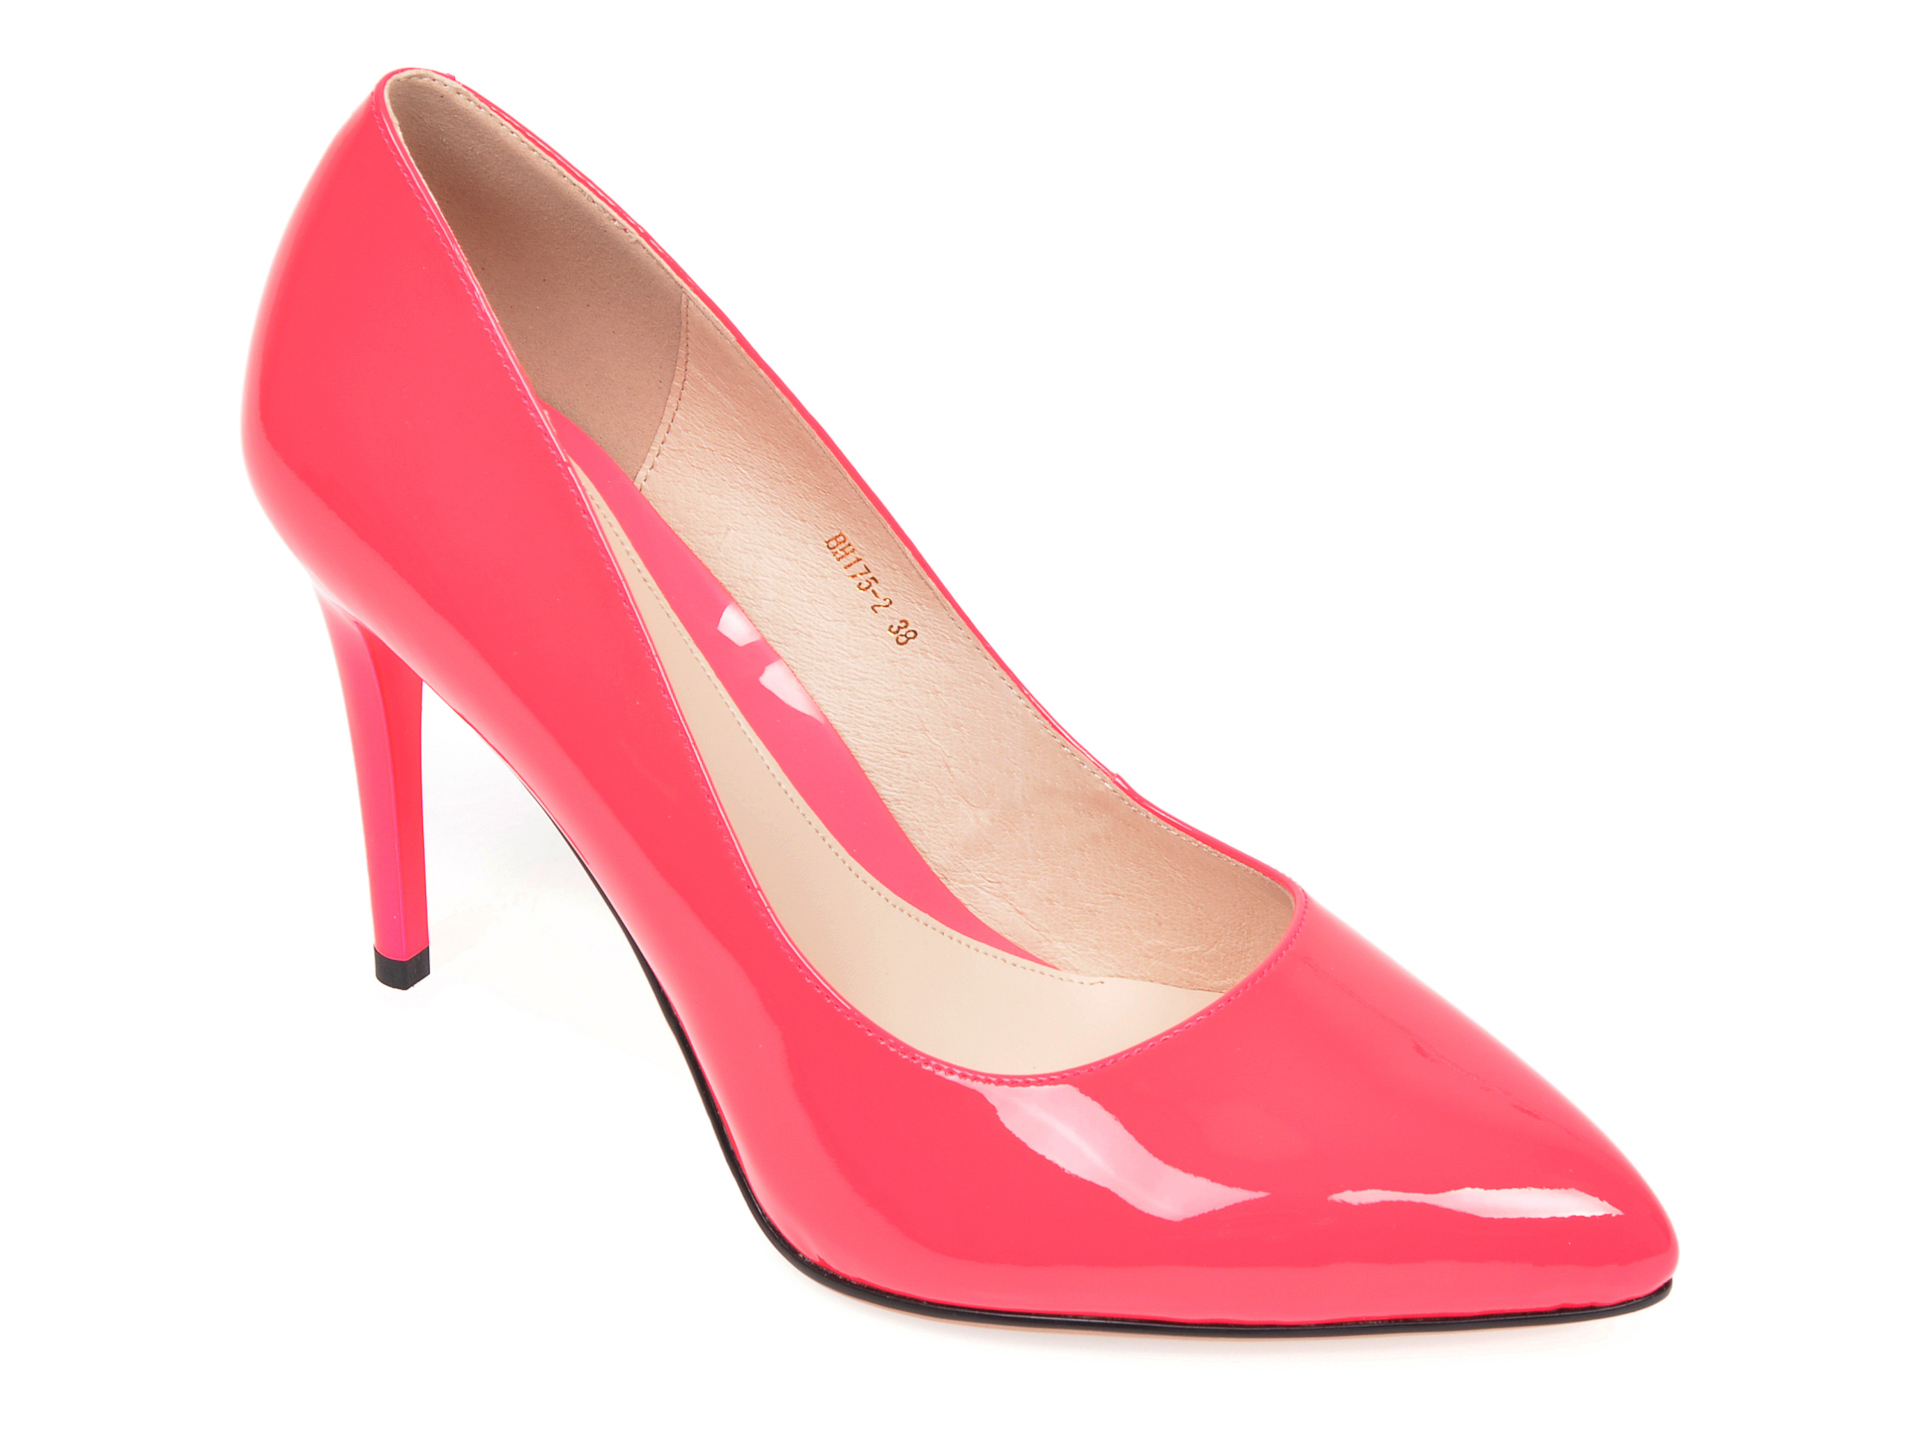 Pantofi EPICA fucsia, BH175, din piele naturala lacuita